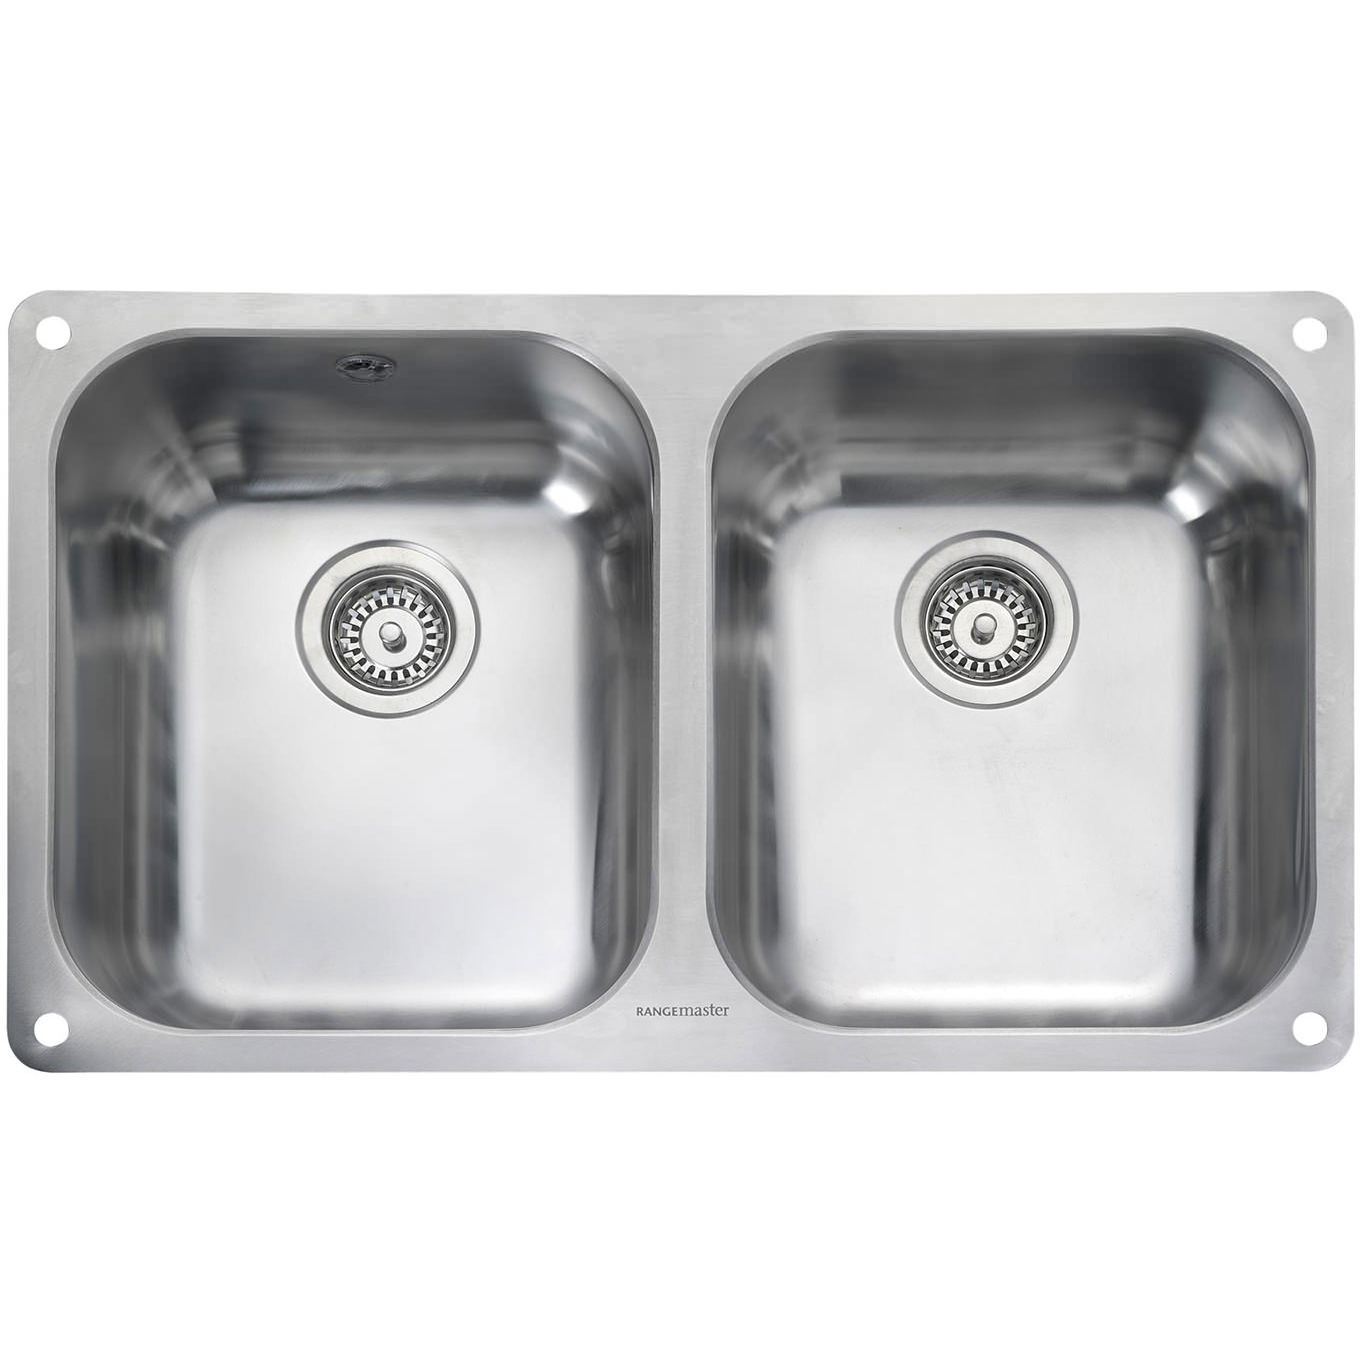 Rangemaster Atlantic Classic 2 Bowl Stainless Steel Undermount Kitchen Sink